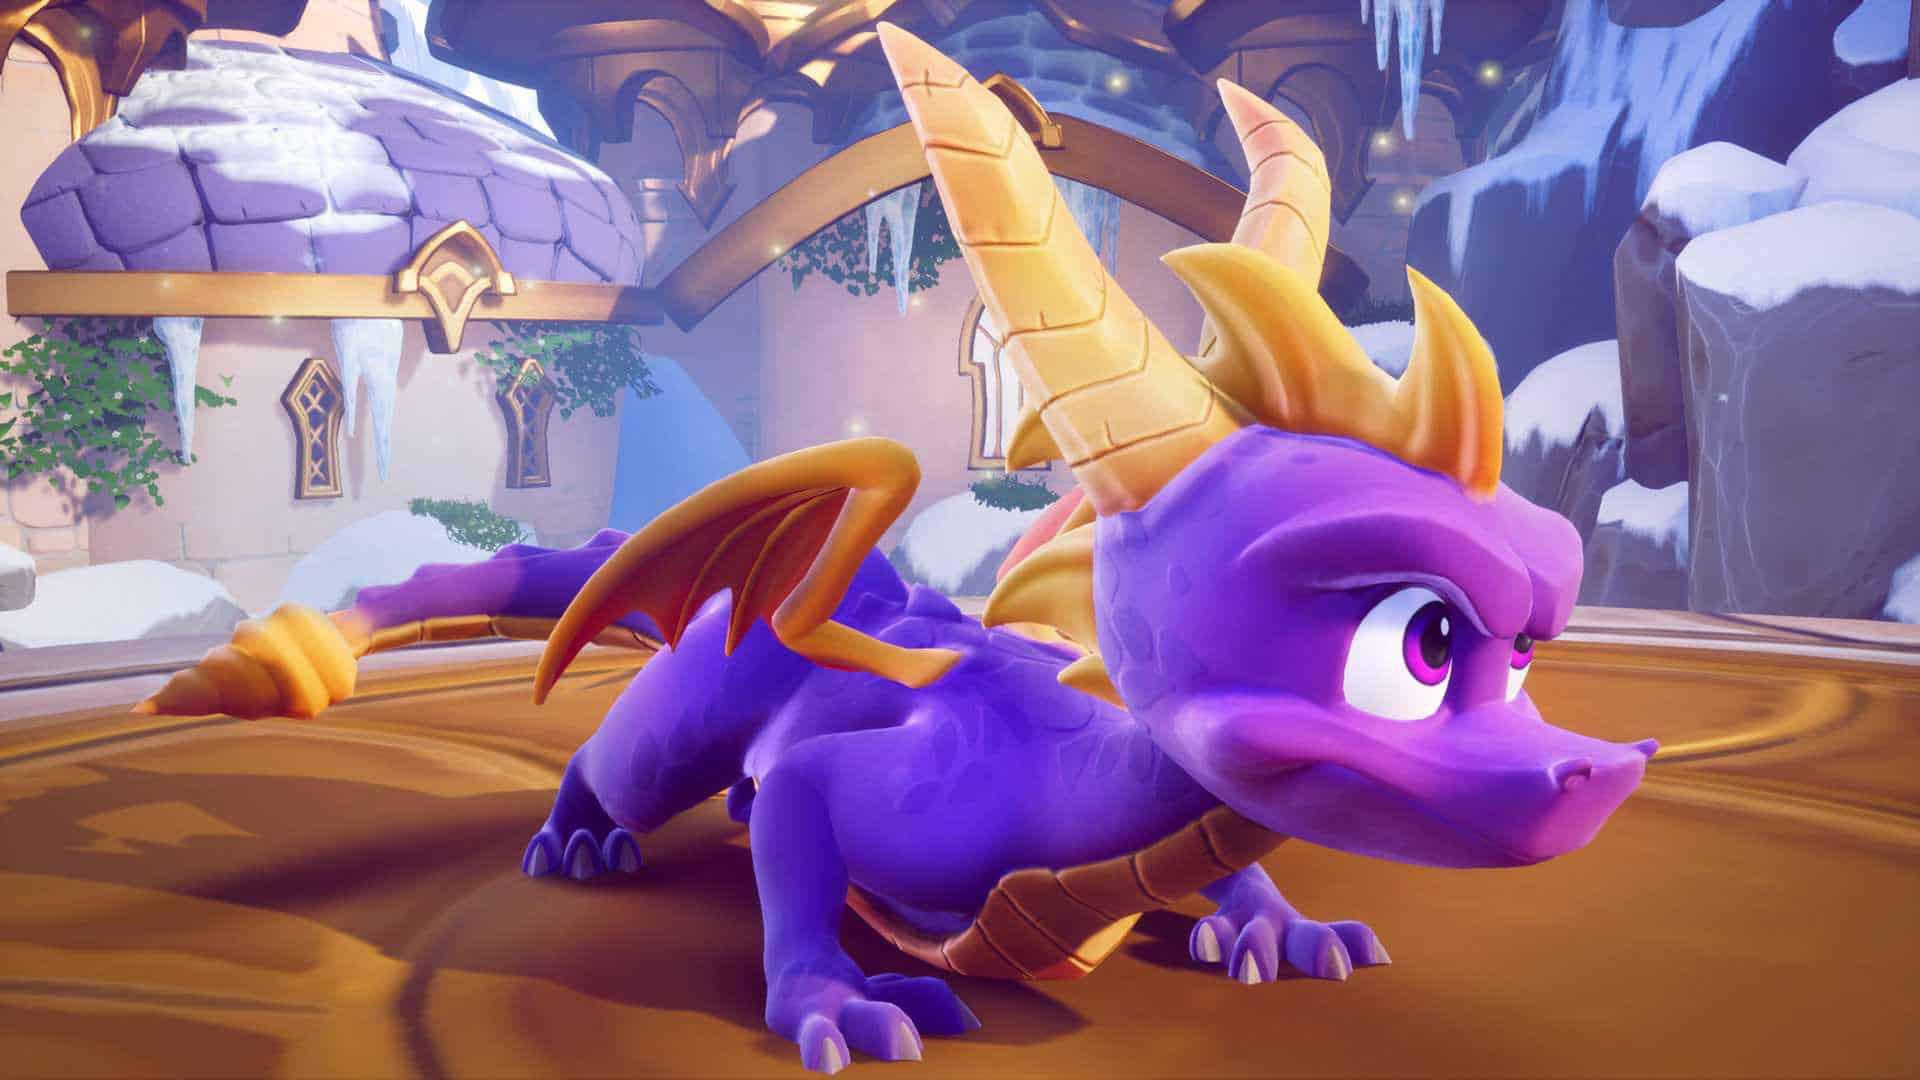 Spyro Reignited Trilogy 02 - بازی Spyro Reignited Trilogy مخصوص PS4